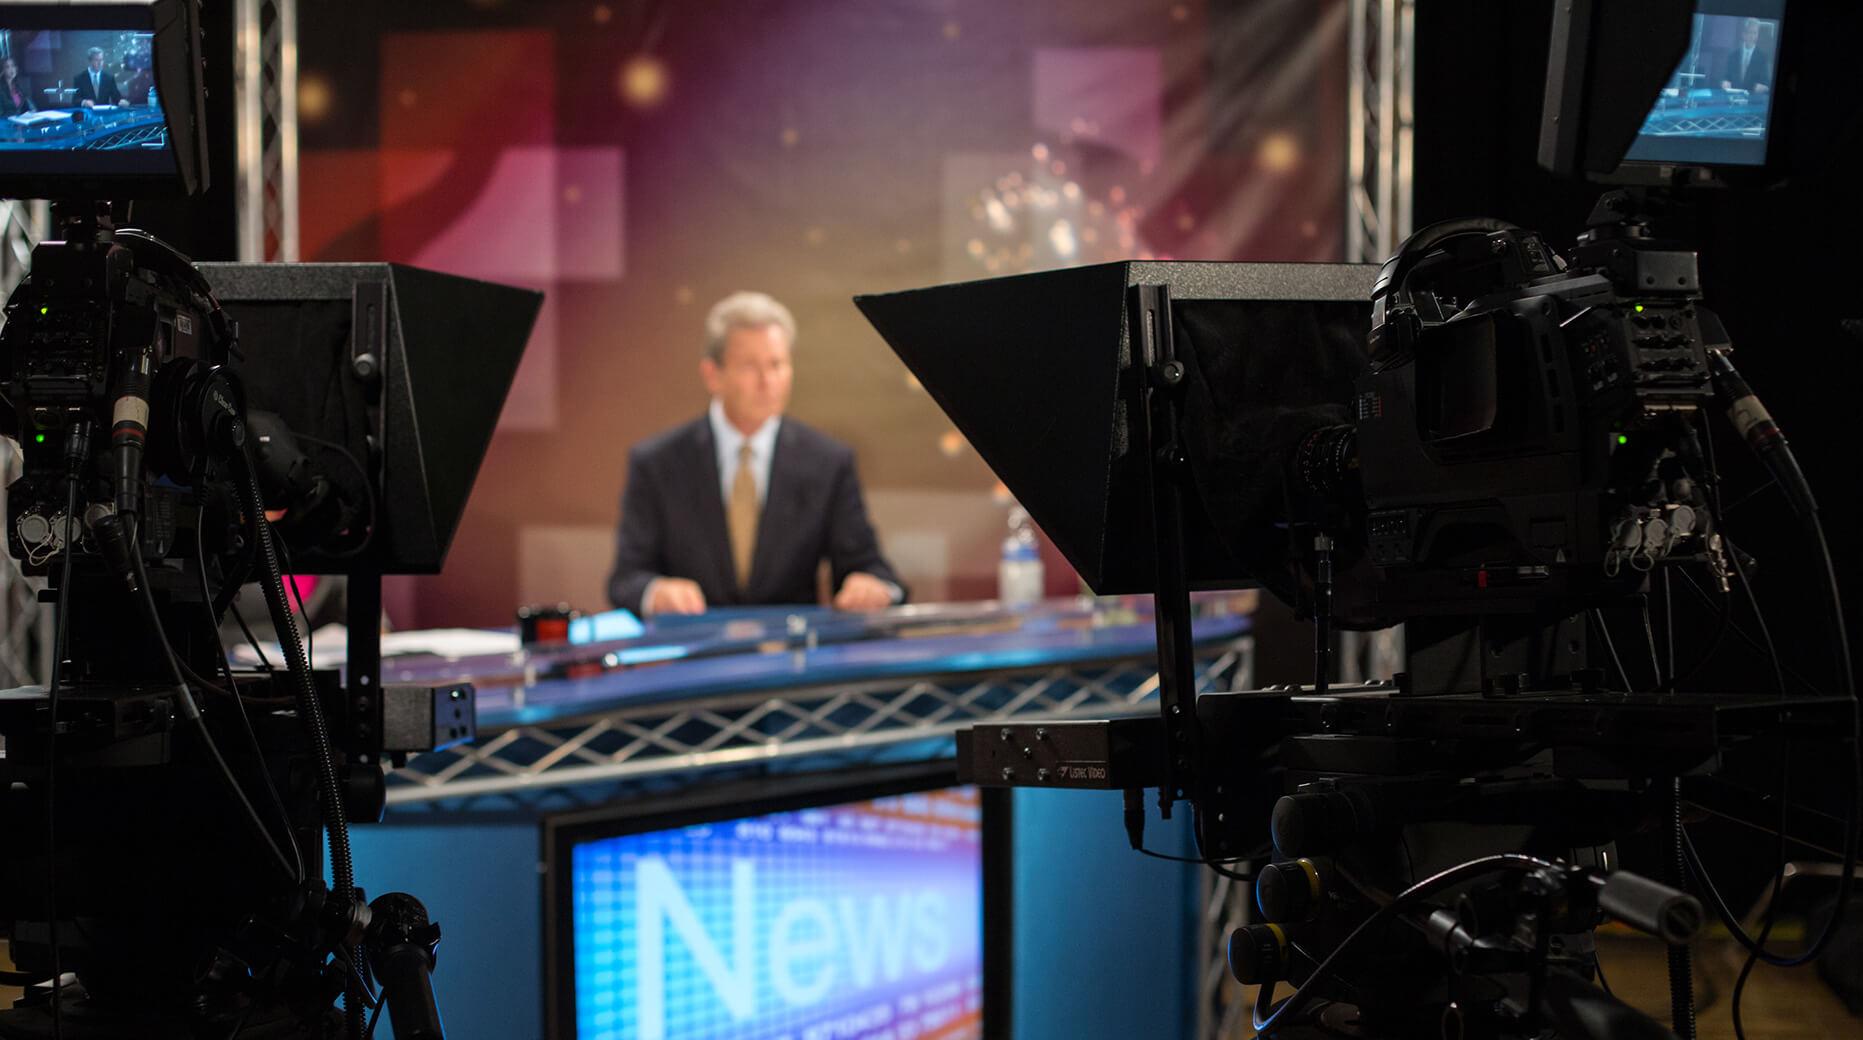 news anchor at anchor desk as seen from behind camera